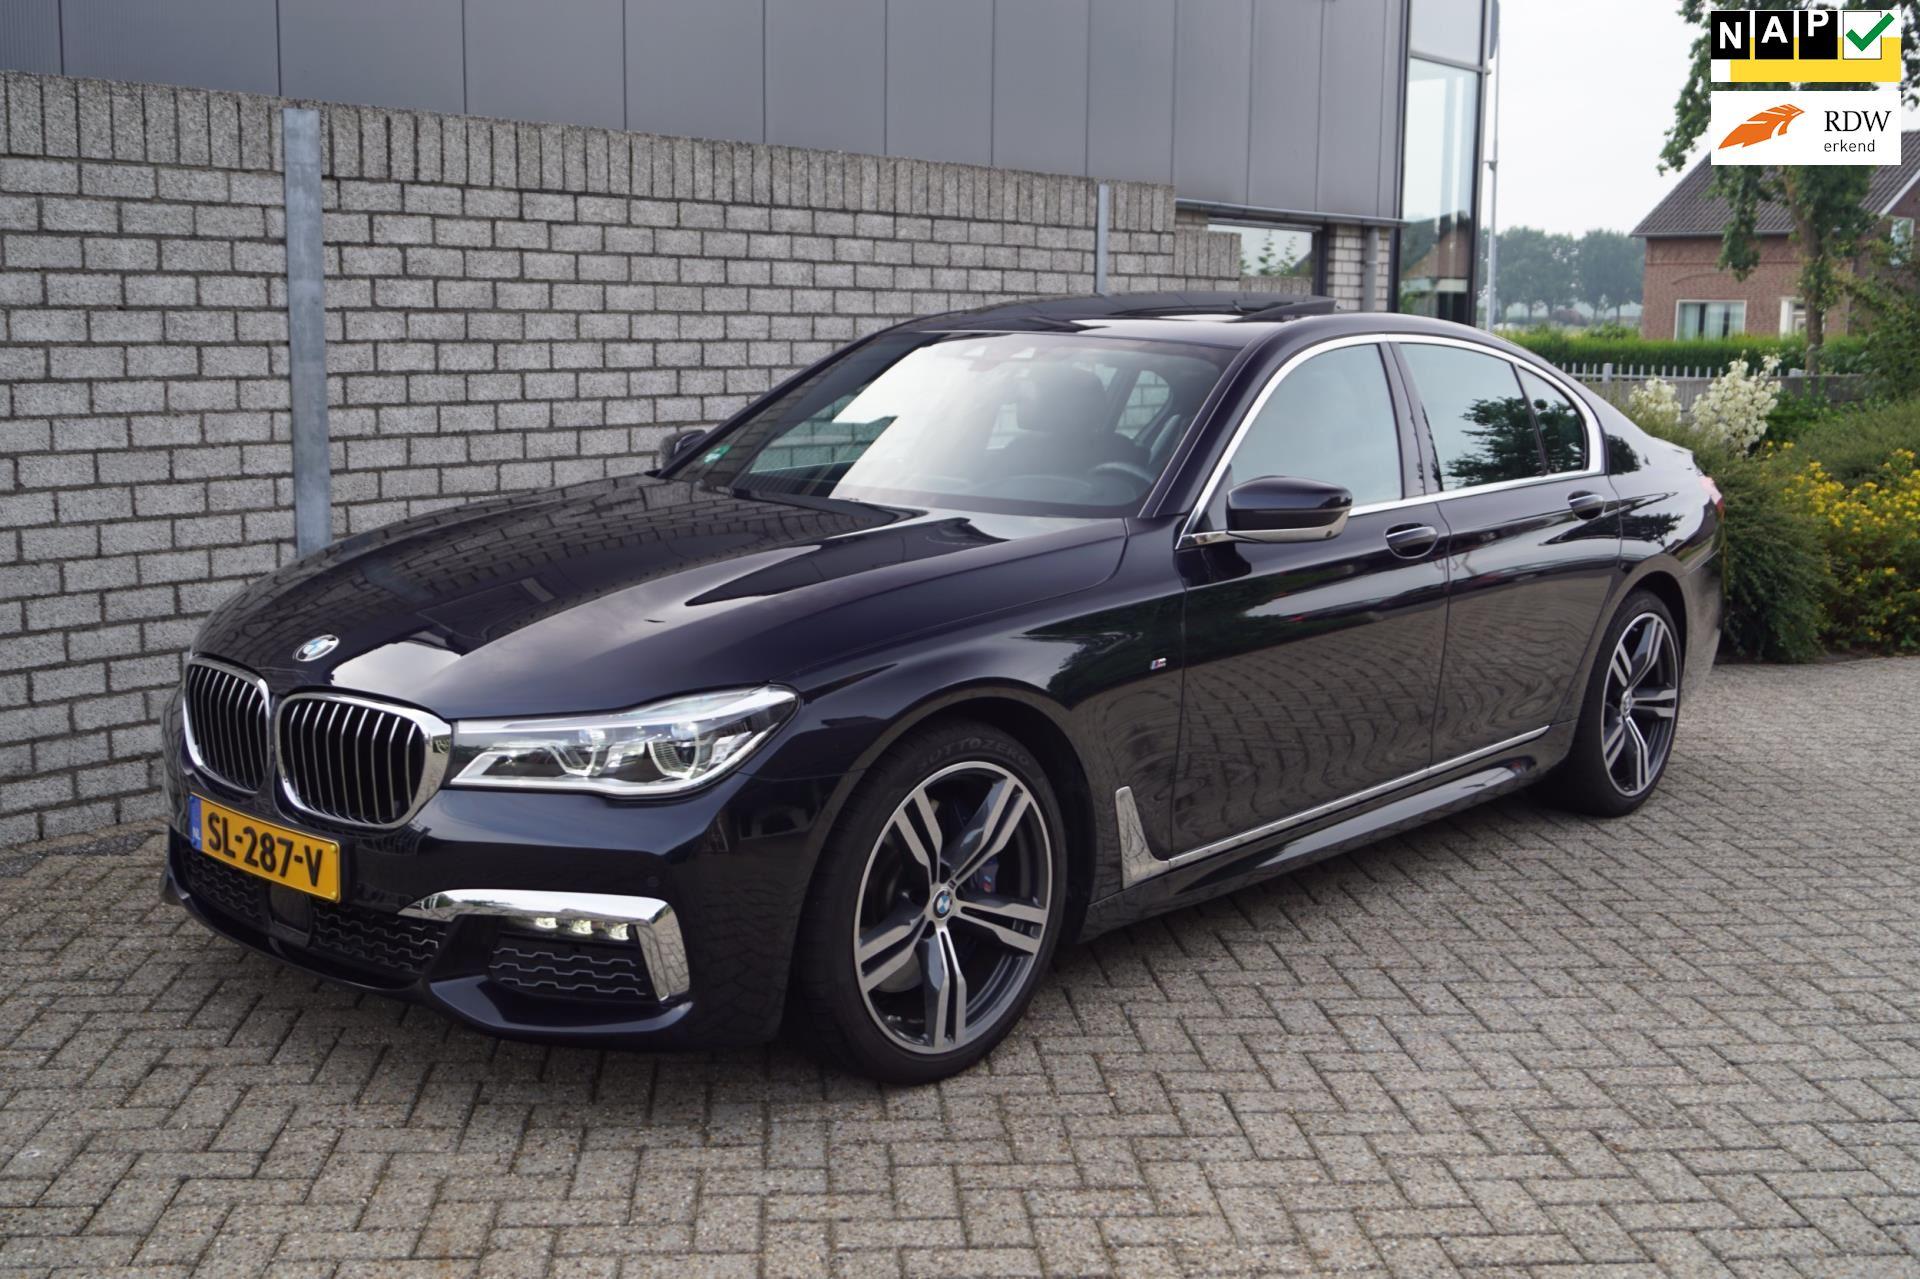 BMW 7-serie occasion - Autobedrijf H. Wijdeven V.o.f.